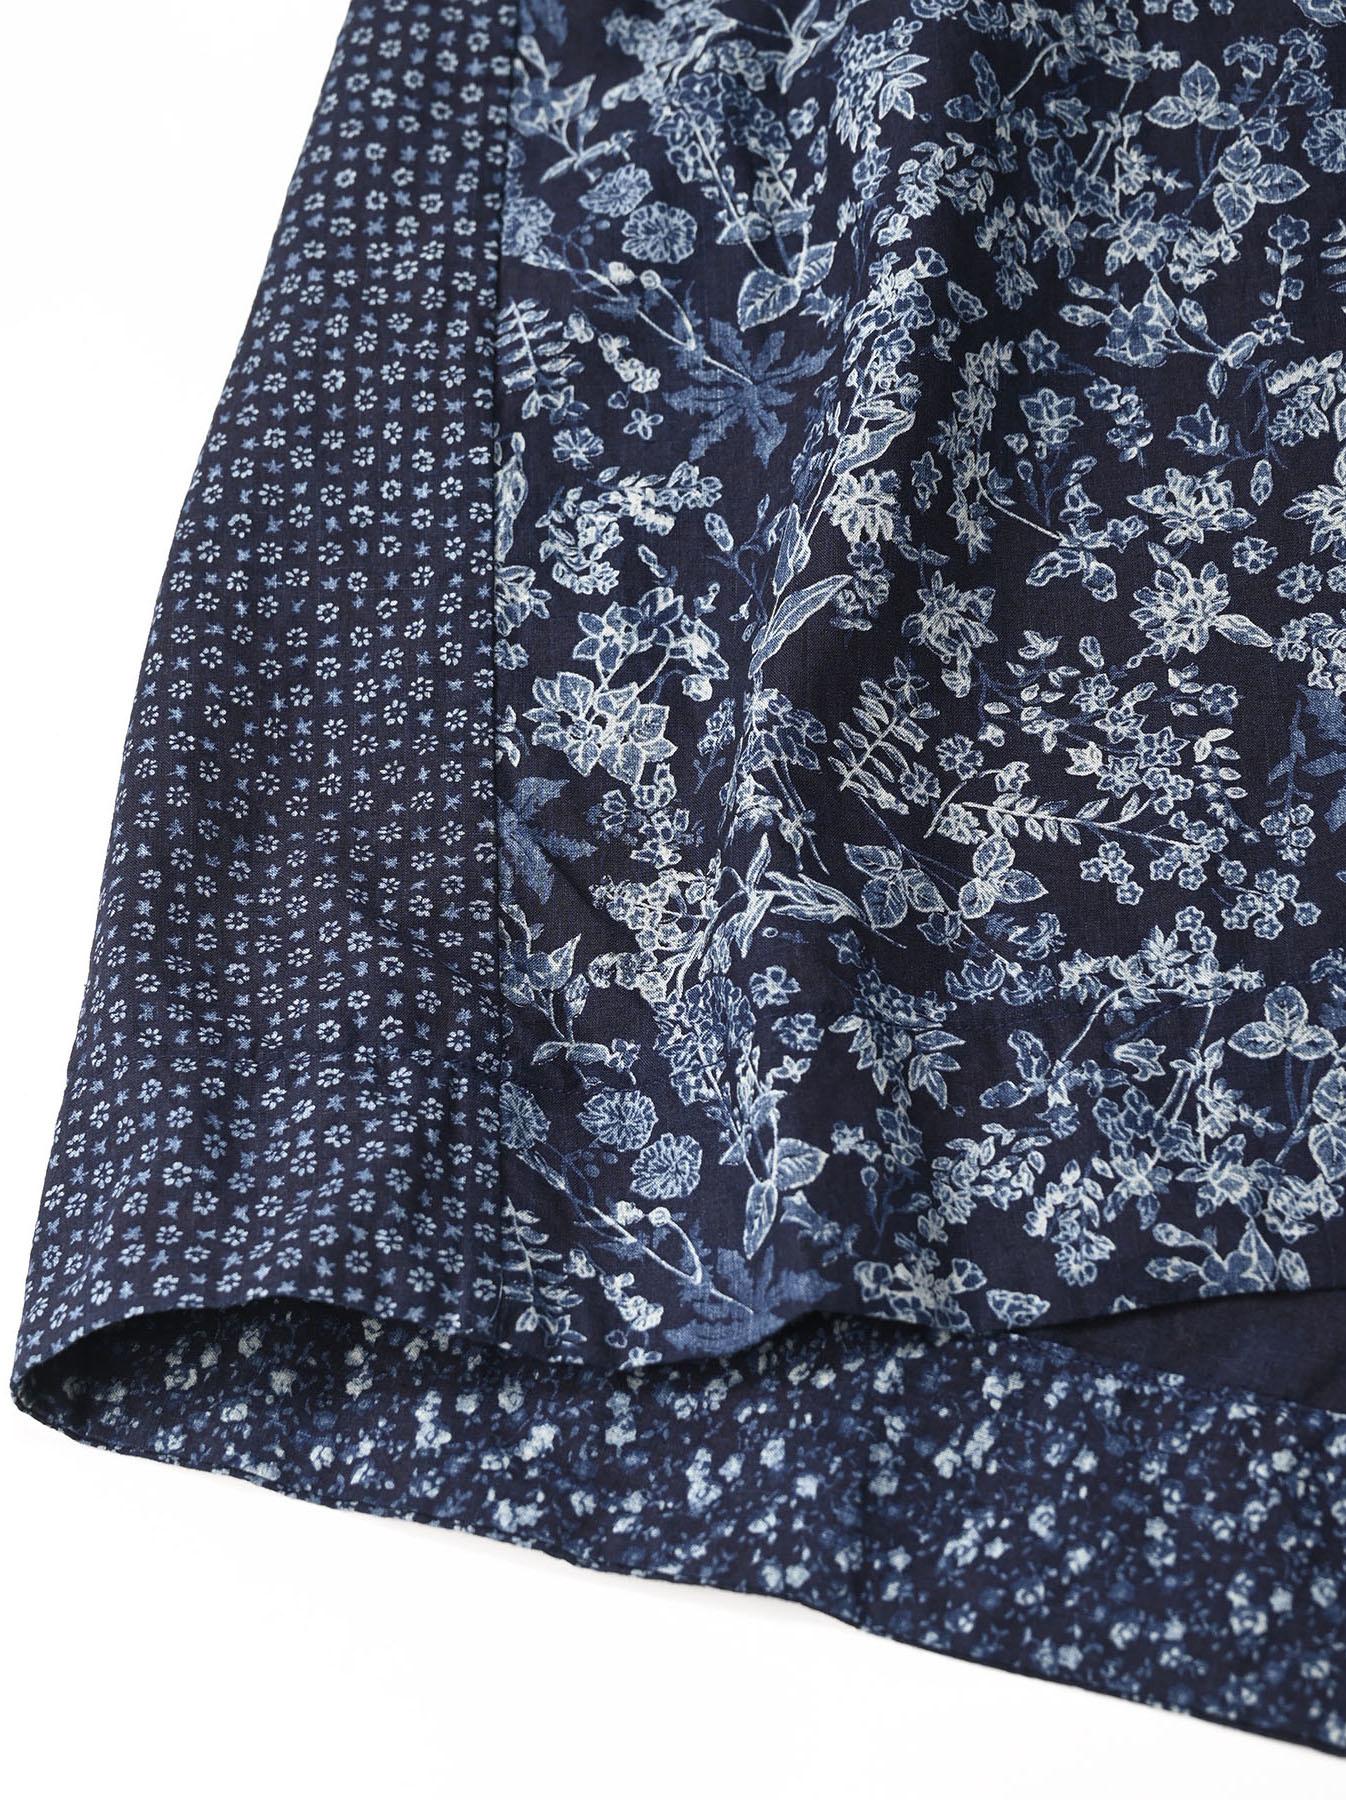 Indigo Tappet Flower Patchwork Skirt-8